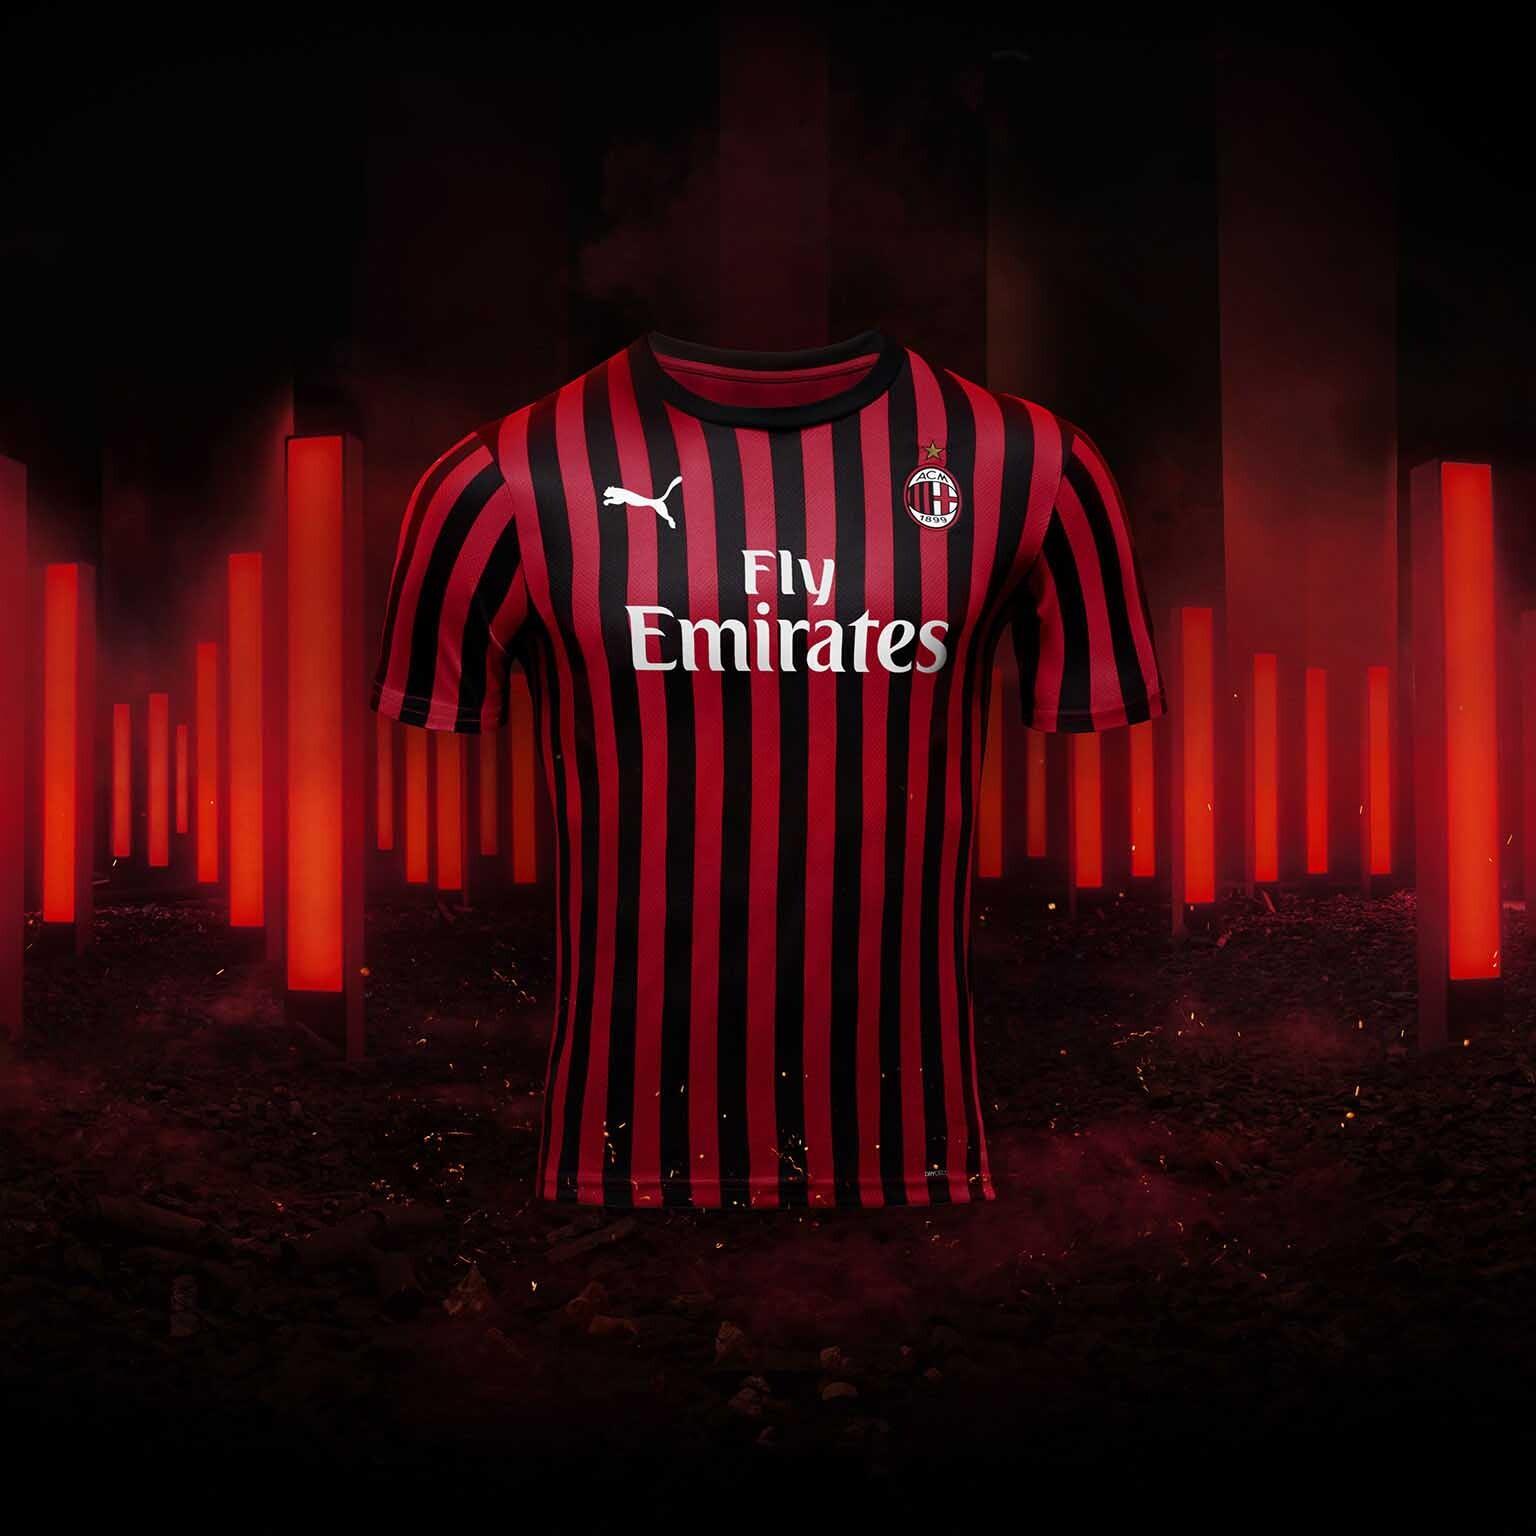 buy online 740d5 7ba28 AC Milan: A New Milan | AC Milan Kits, Jerseys, Shirts ...